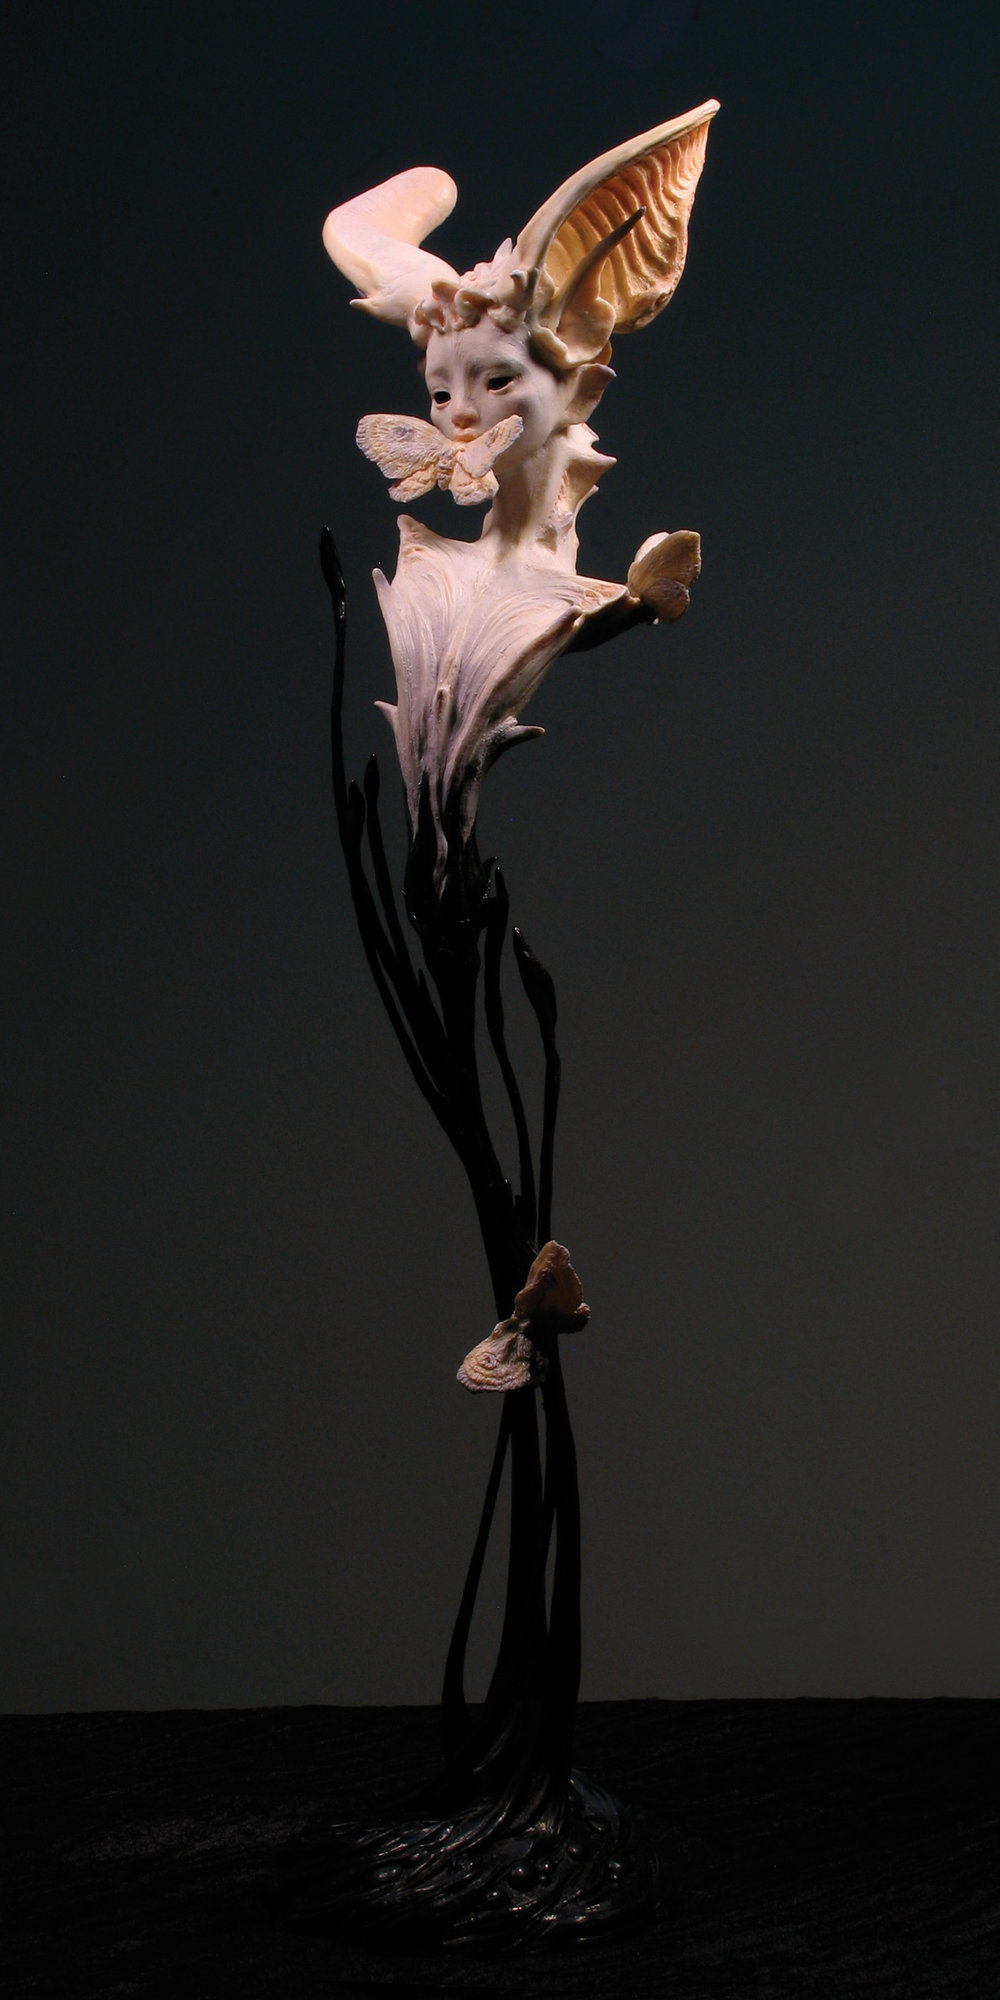 night_bloom_forest_rogers.jpg